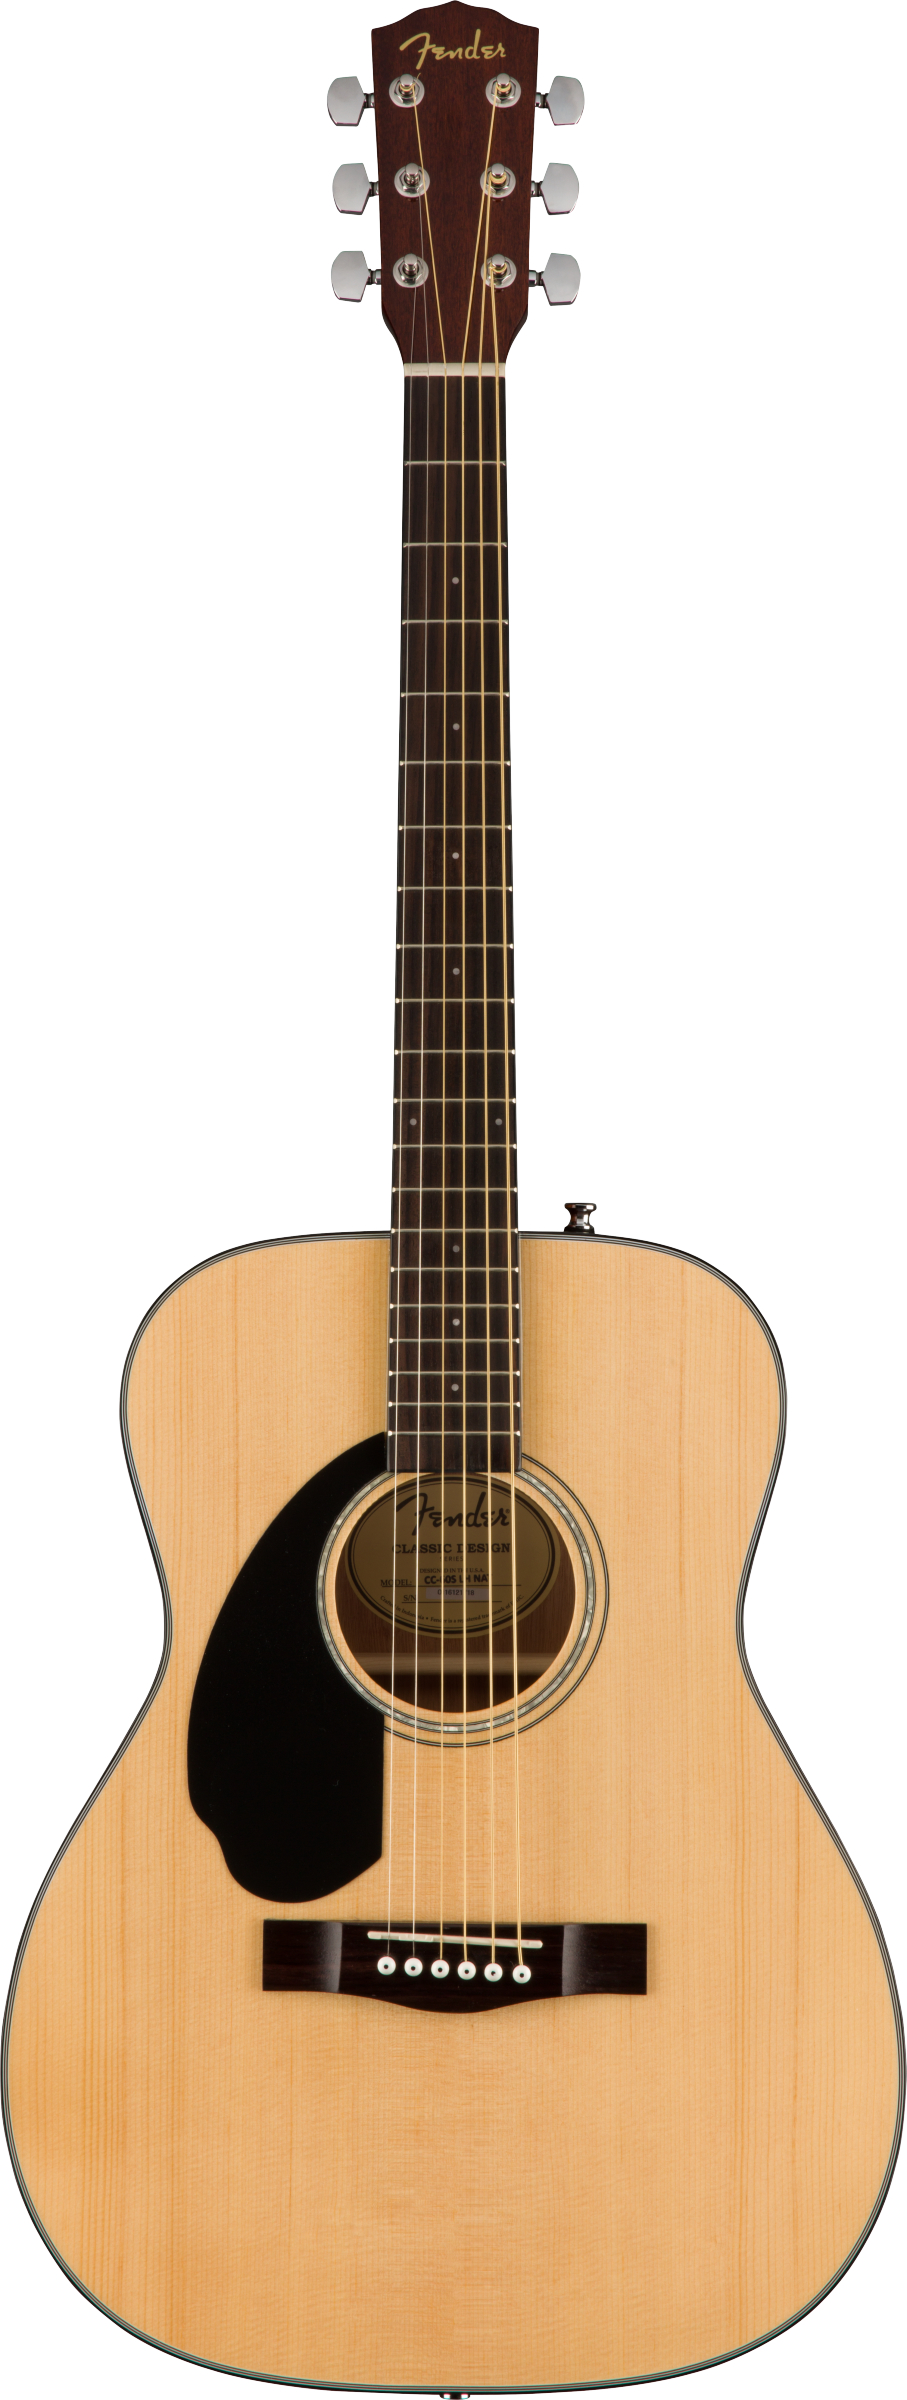 Squier CC-60S Concert LH, Walnut Fingerboard - Natural